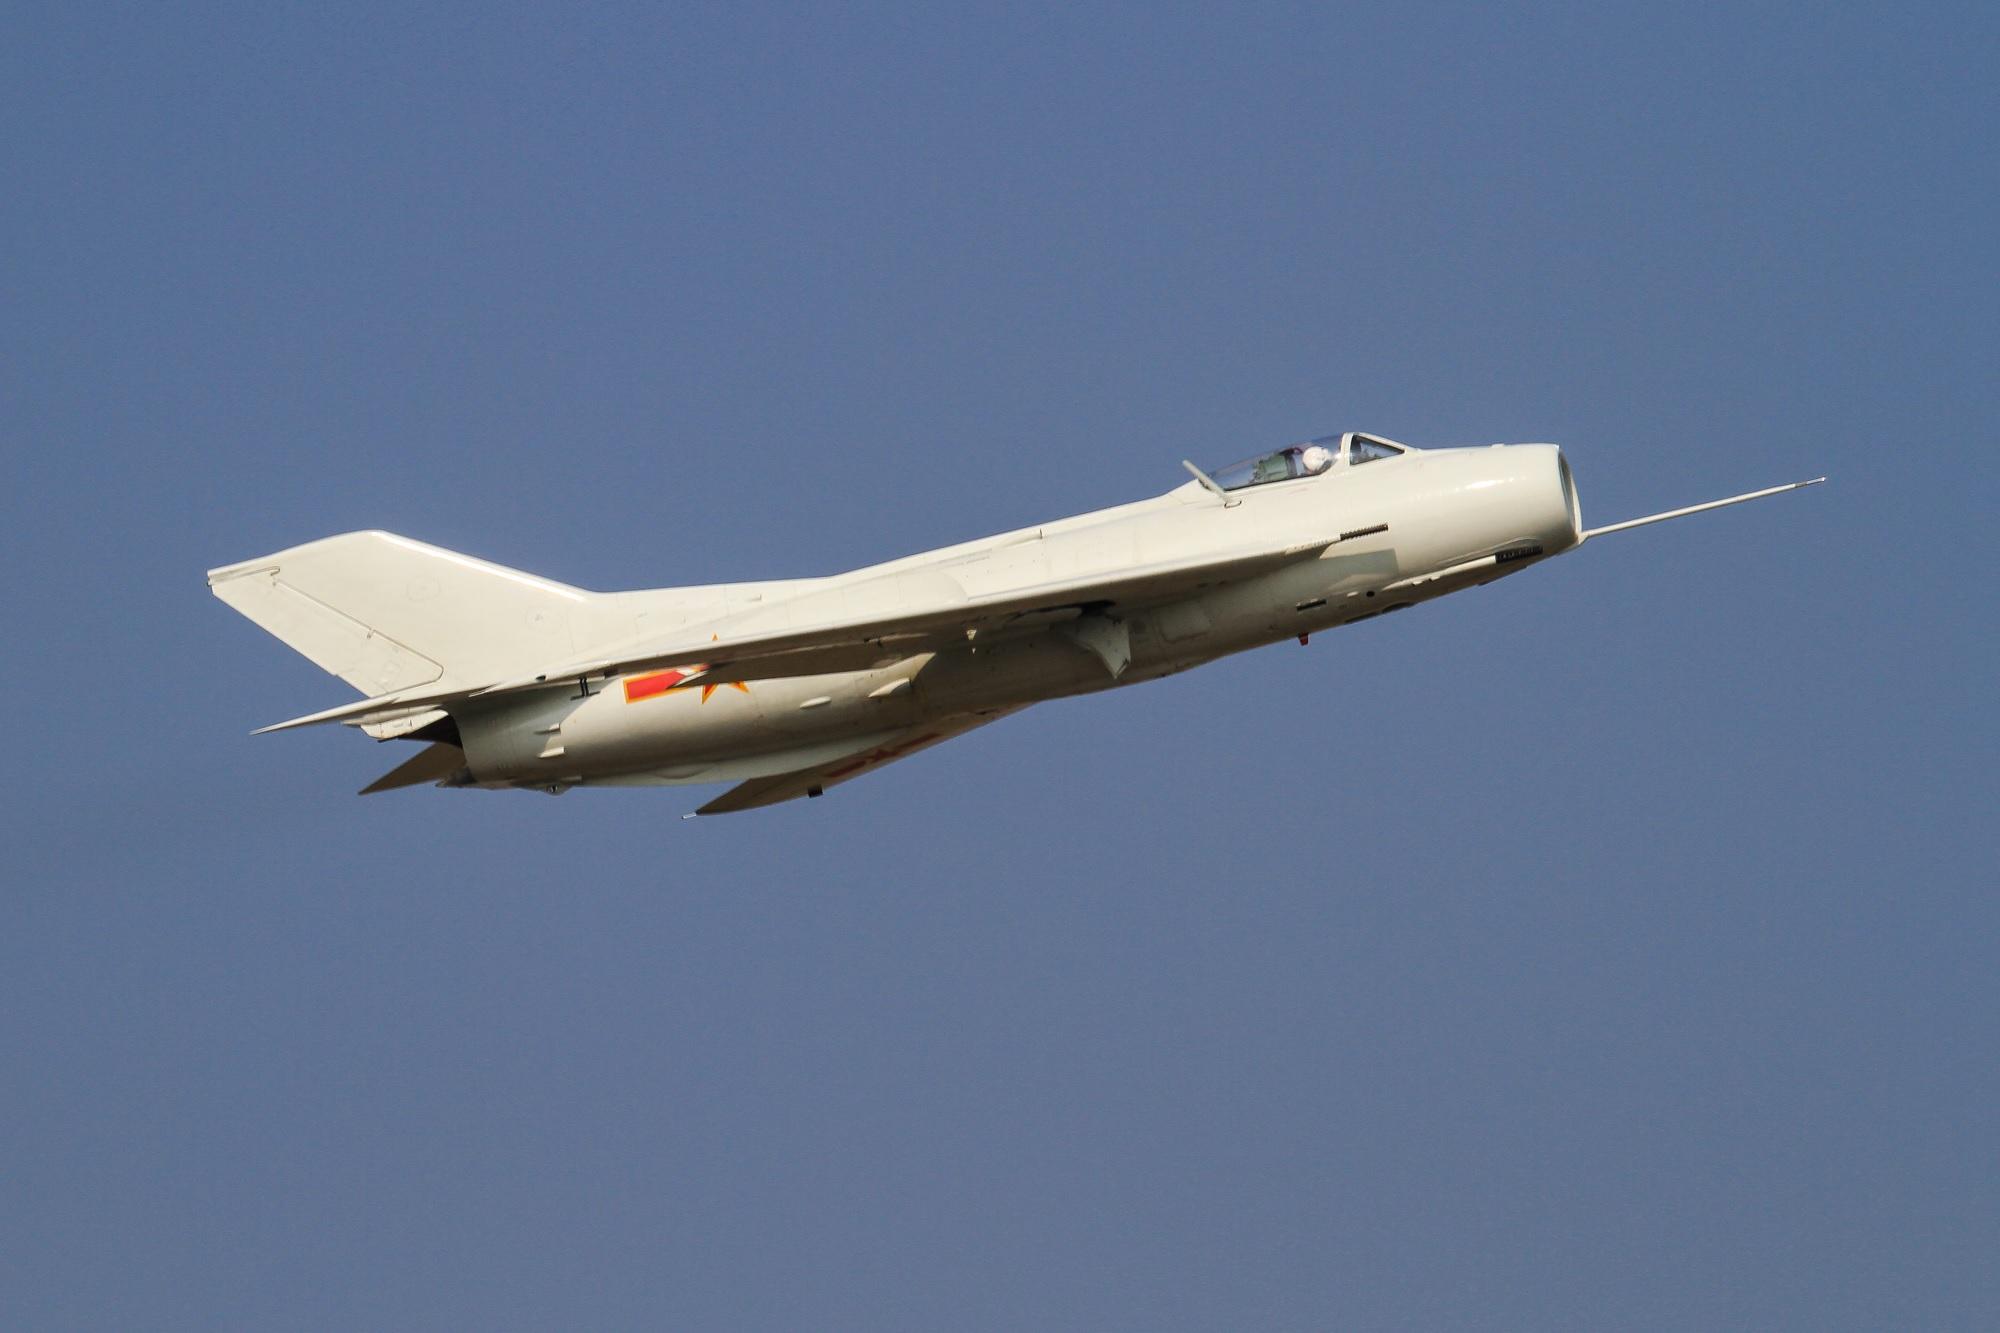 Kineski lovački avion Shenyang J-6 u letu / Foto Wikimedia Commons